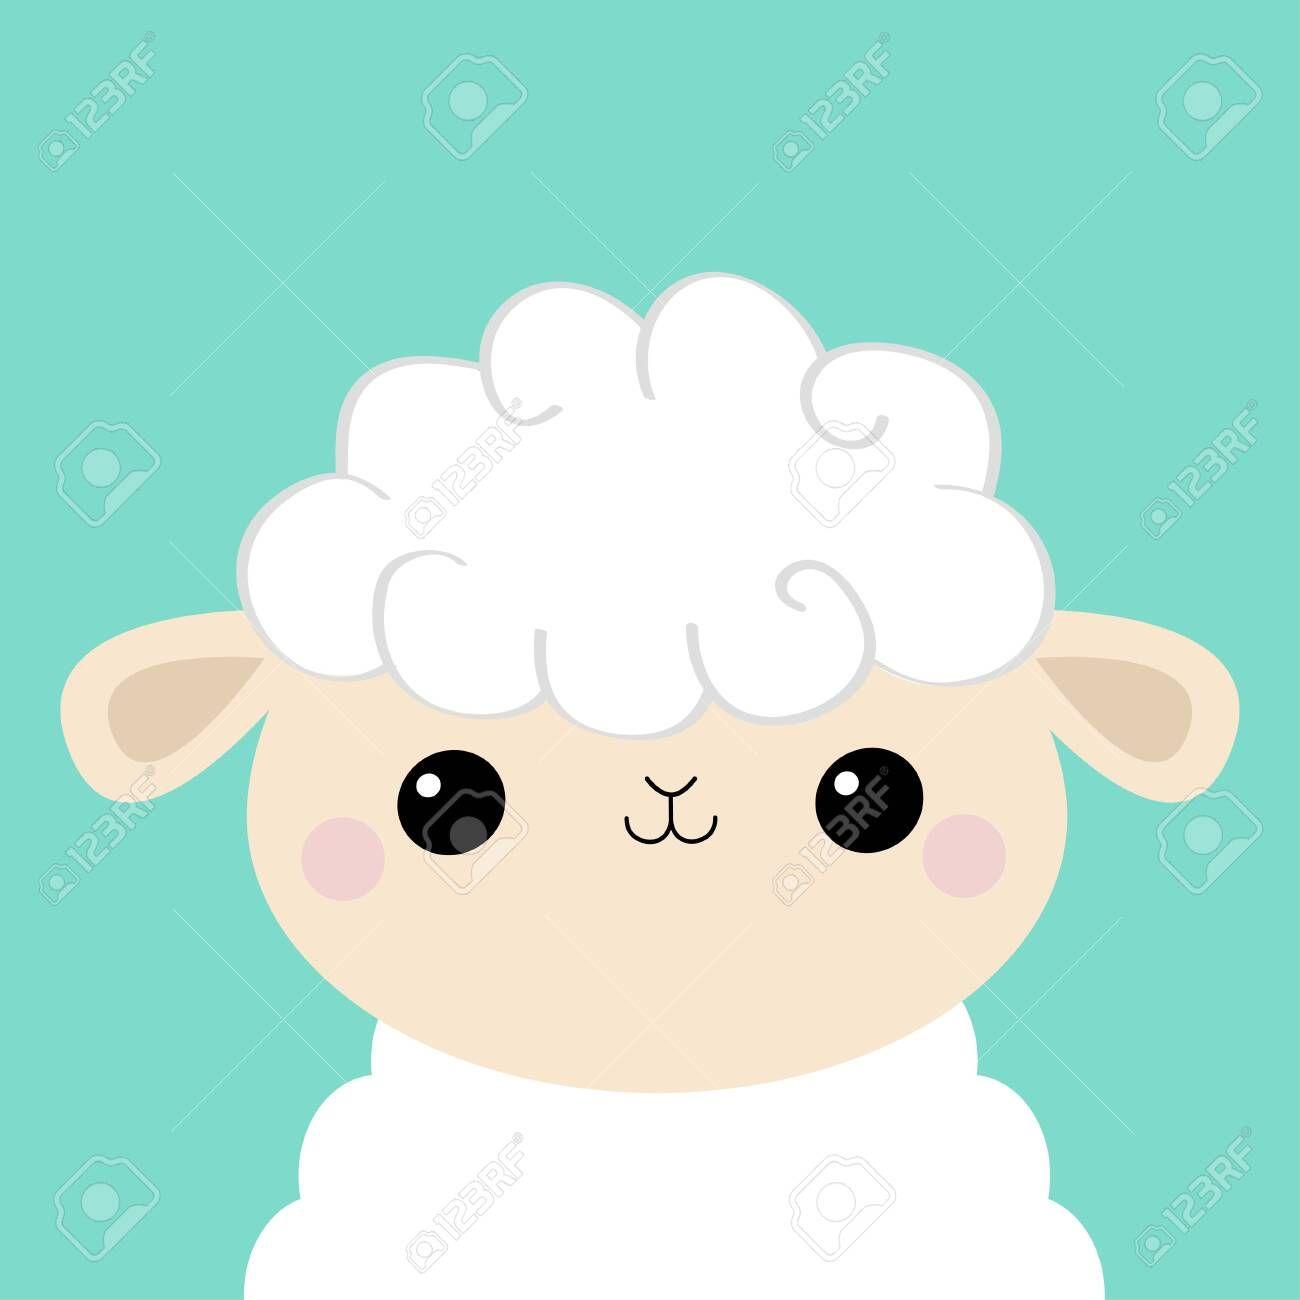 Sheep Lamb Face Head Icon Cloud Shape Cute Cartoon Kawaii Funny Smiling Baby Character Nursery Decoration S Cute Cartoon Sheep And Lamb Vector Illustration